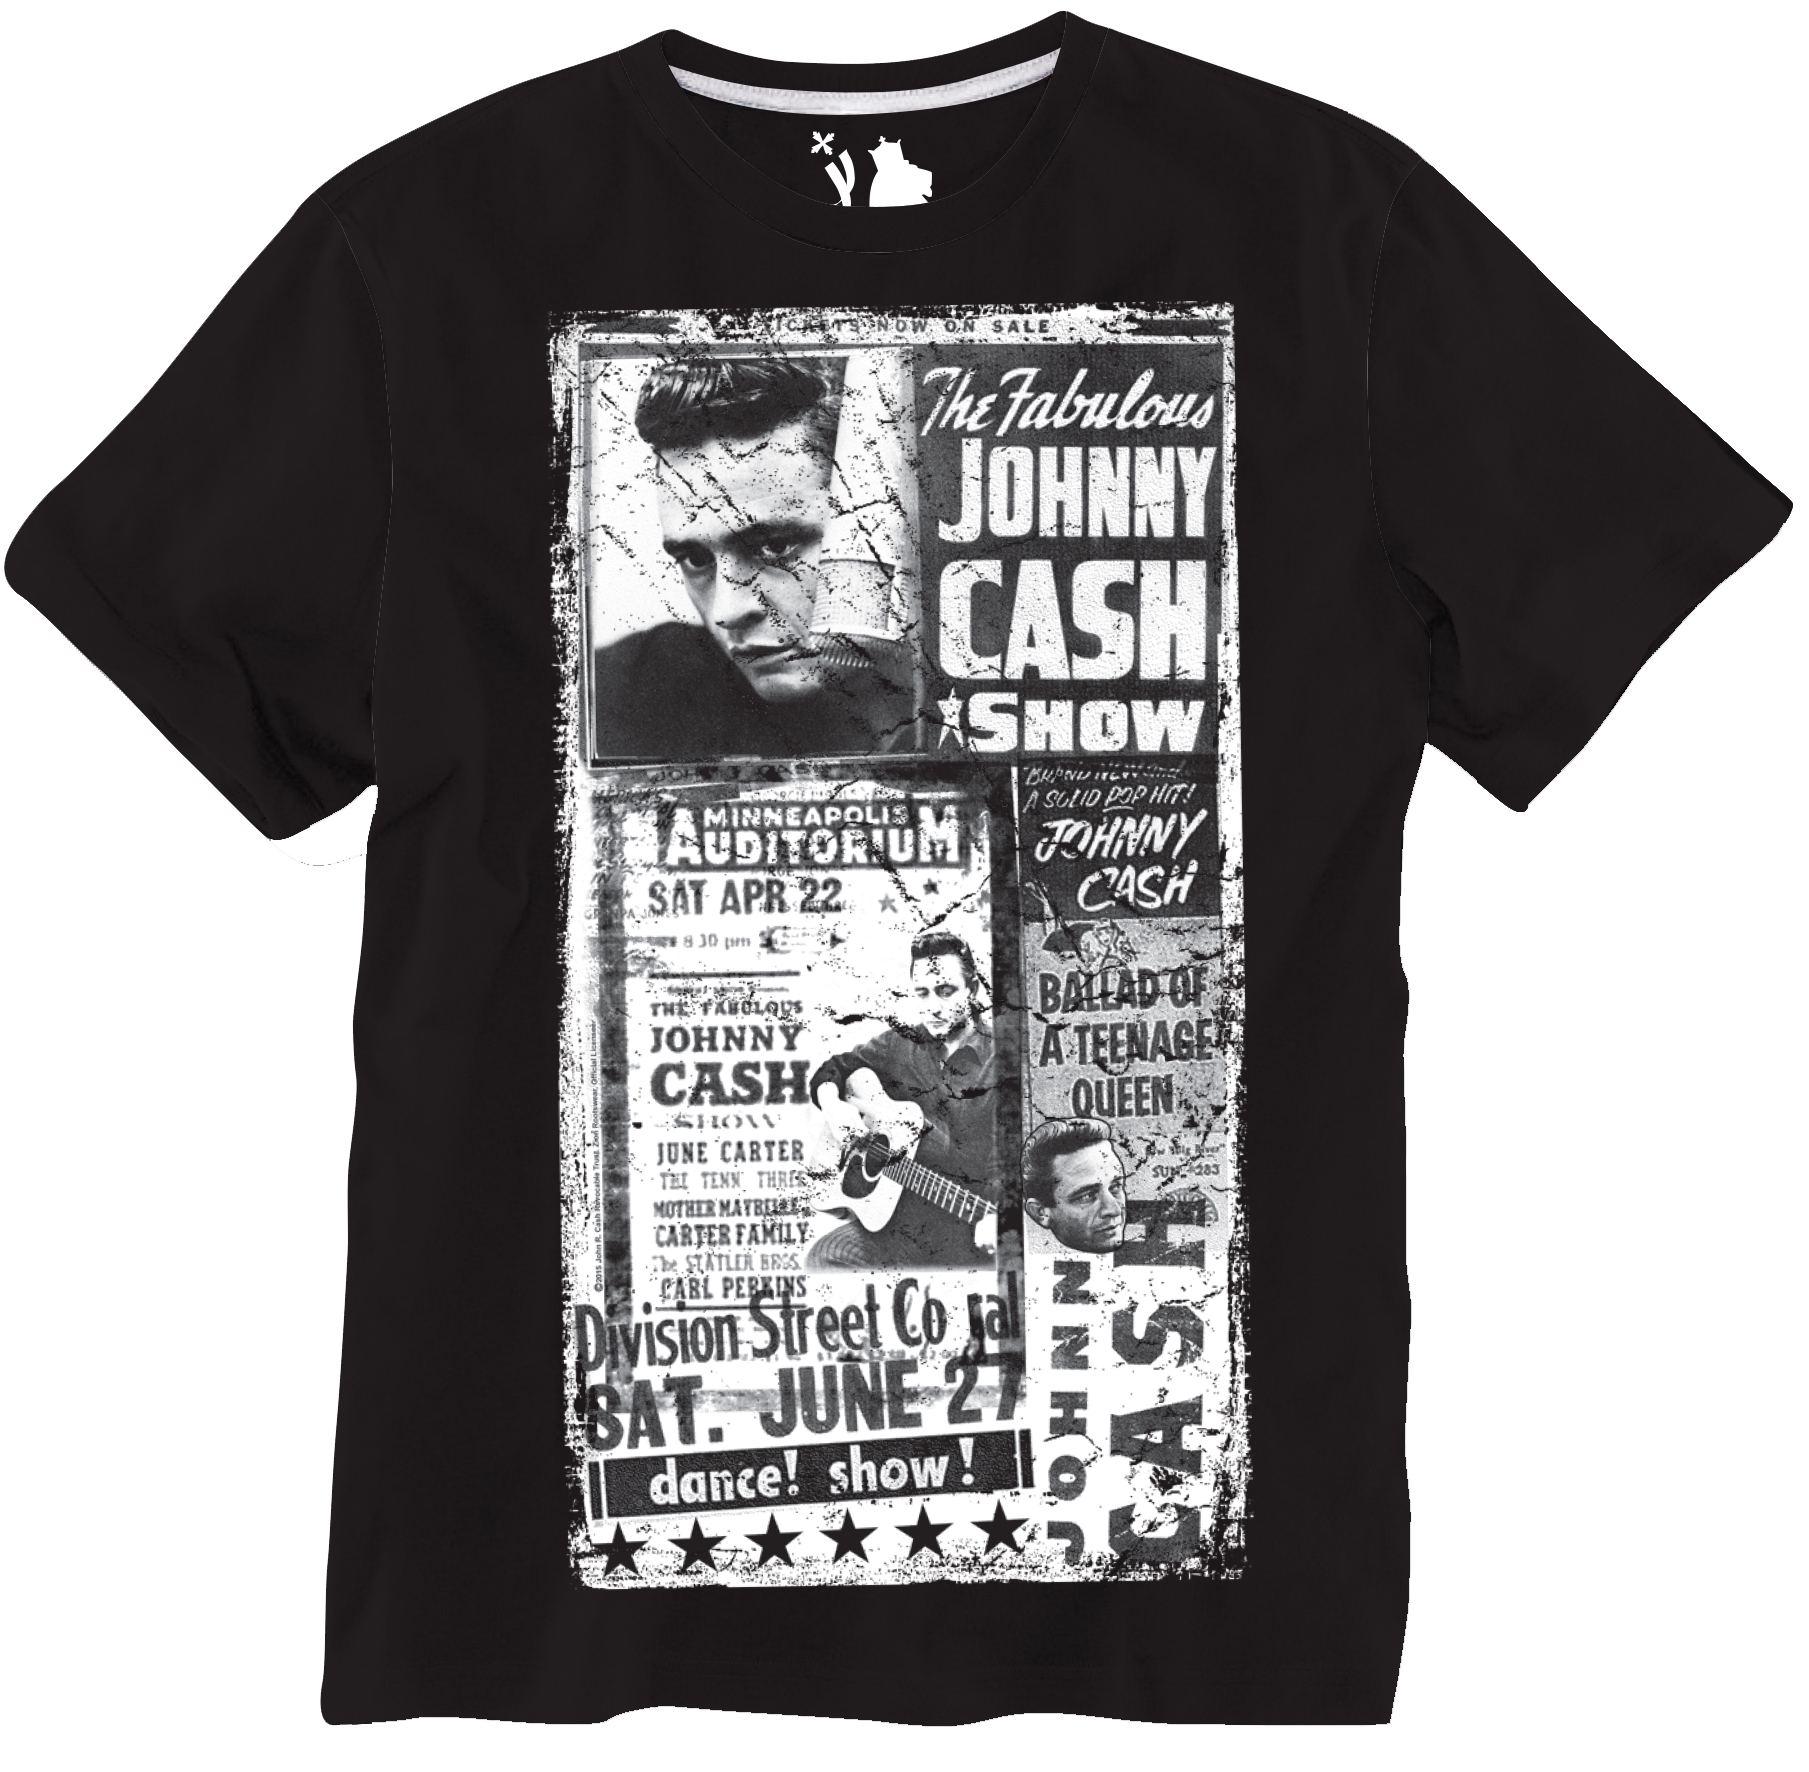 65fa2e1d2 Johnny Cash T/Shirt   plus size t shirts . t shirts ireland   cheap t shirts    Plus size clothing ireland